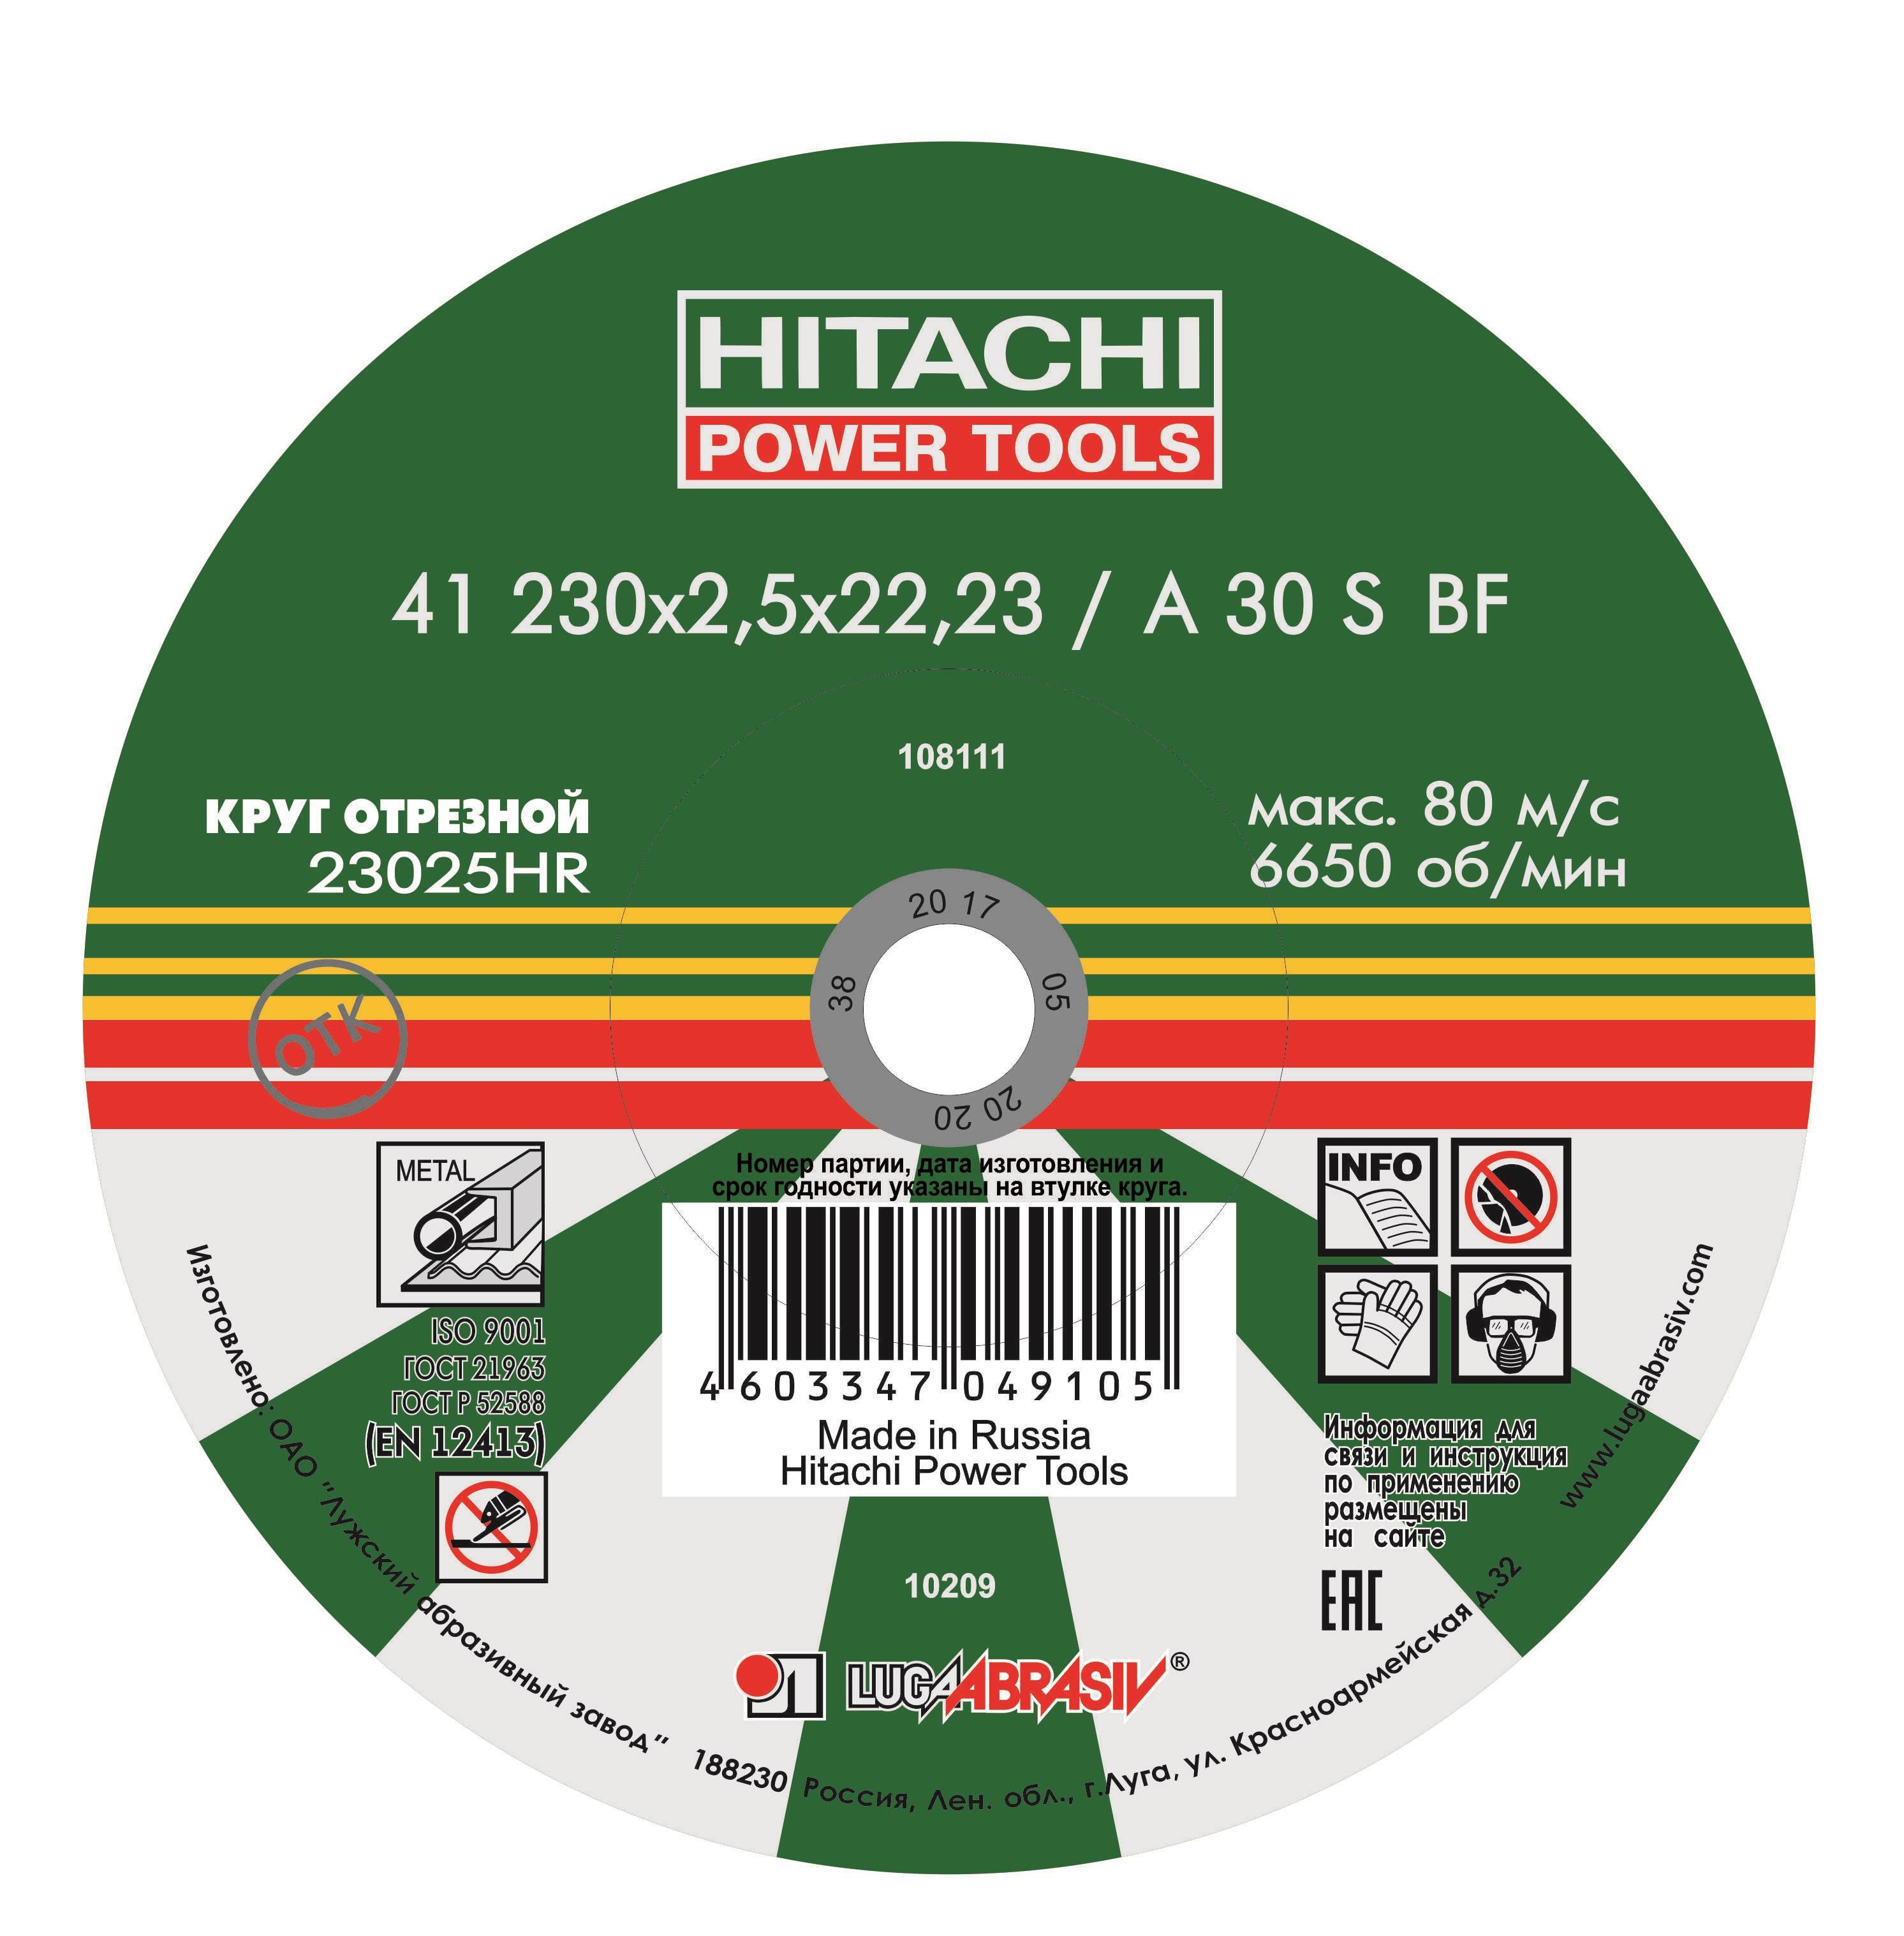 Круг отрезной Hitachi А24 230 Х 2,5 Х 22 по металлу 25шт круг отрезной hitachi а24 115 х 1 2 х 22 по металлу 50шт